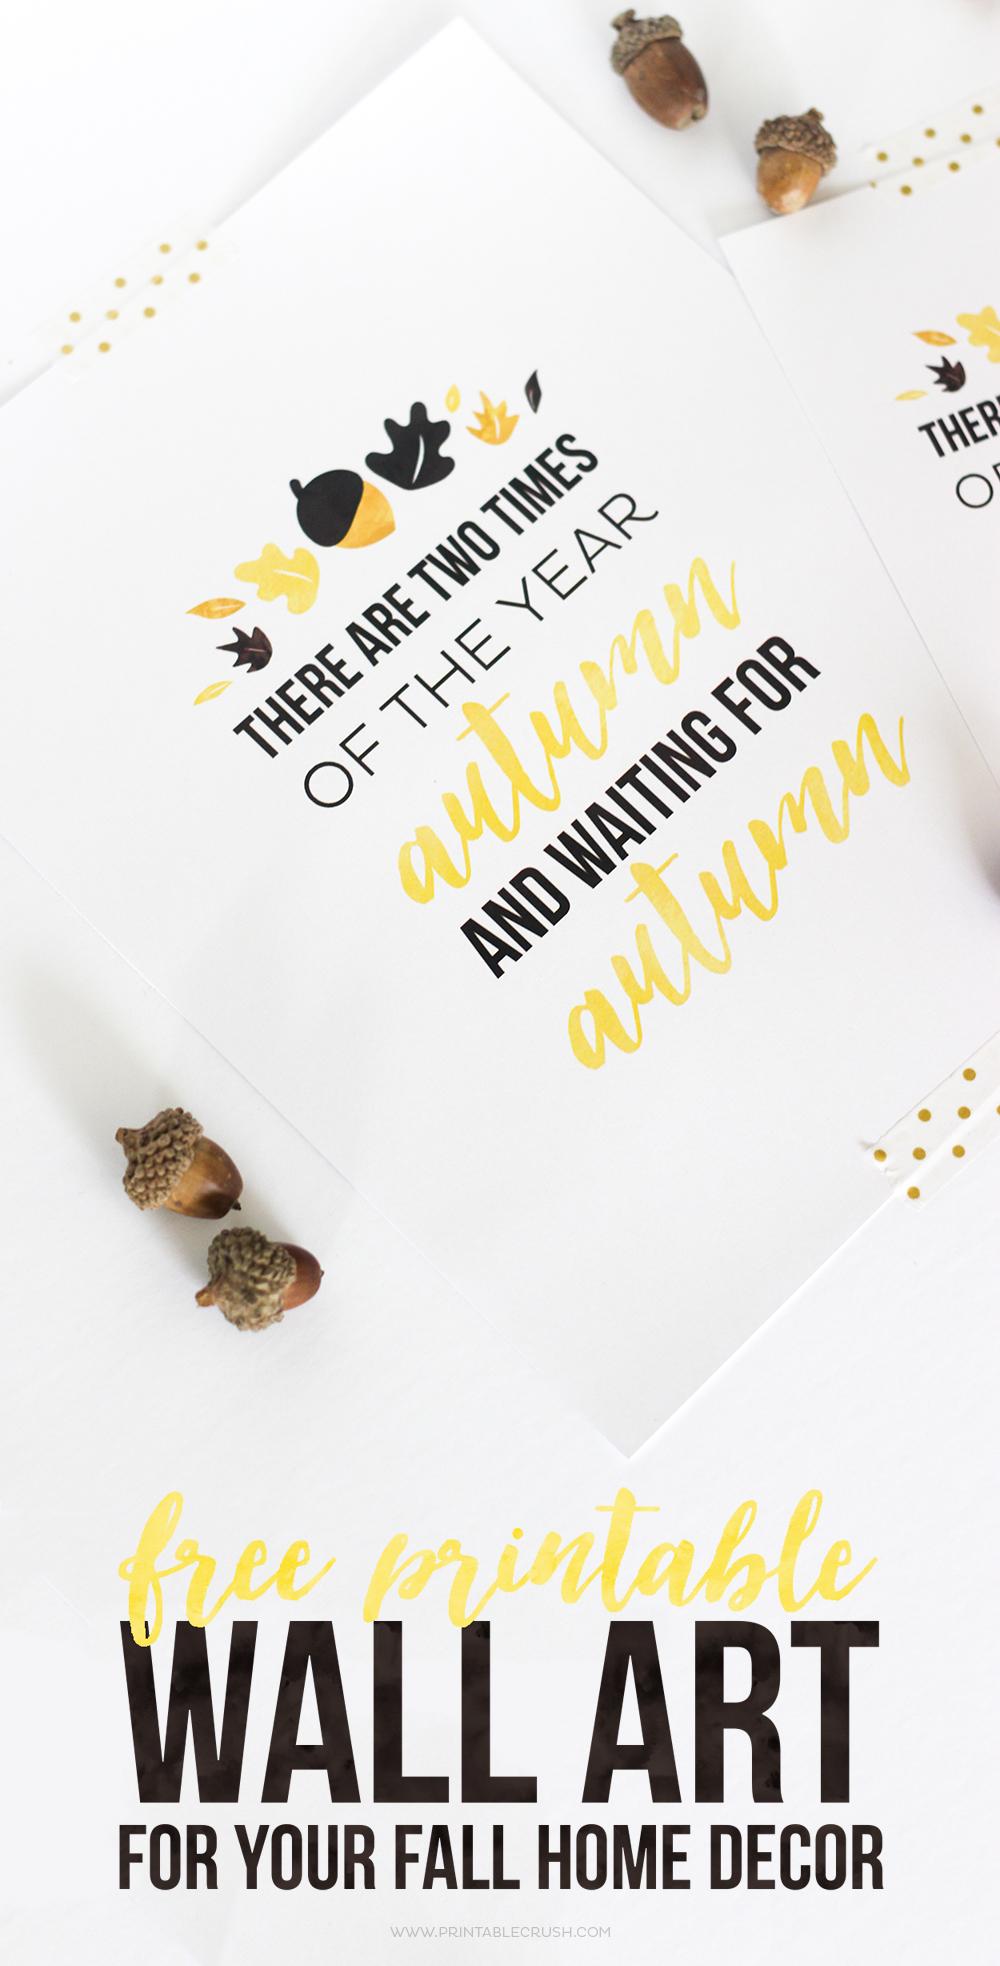 image relating to Free Printable Decor named No cost Printable Wall Artwork for Your Slide Residence Decor - Printable